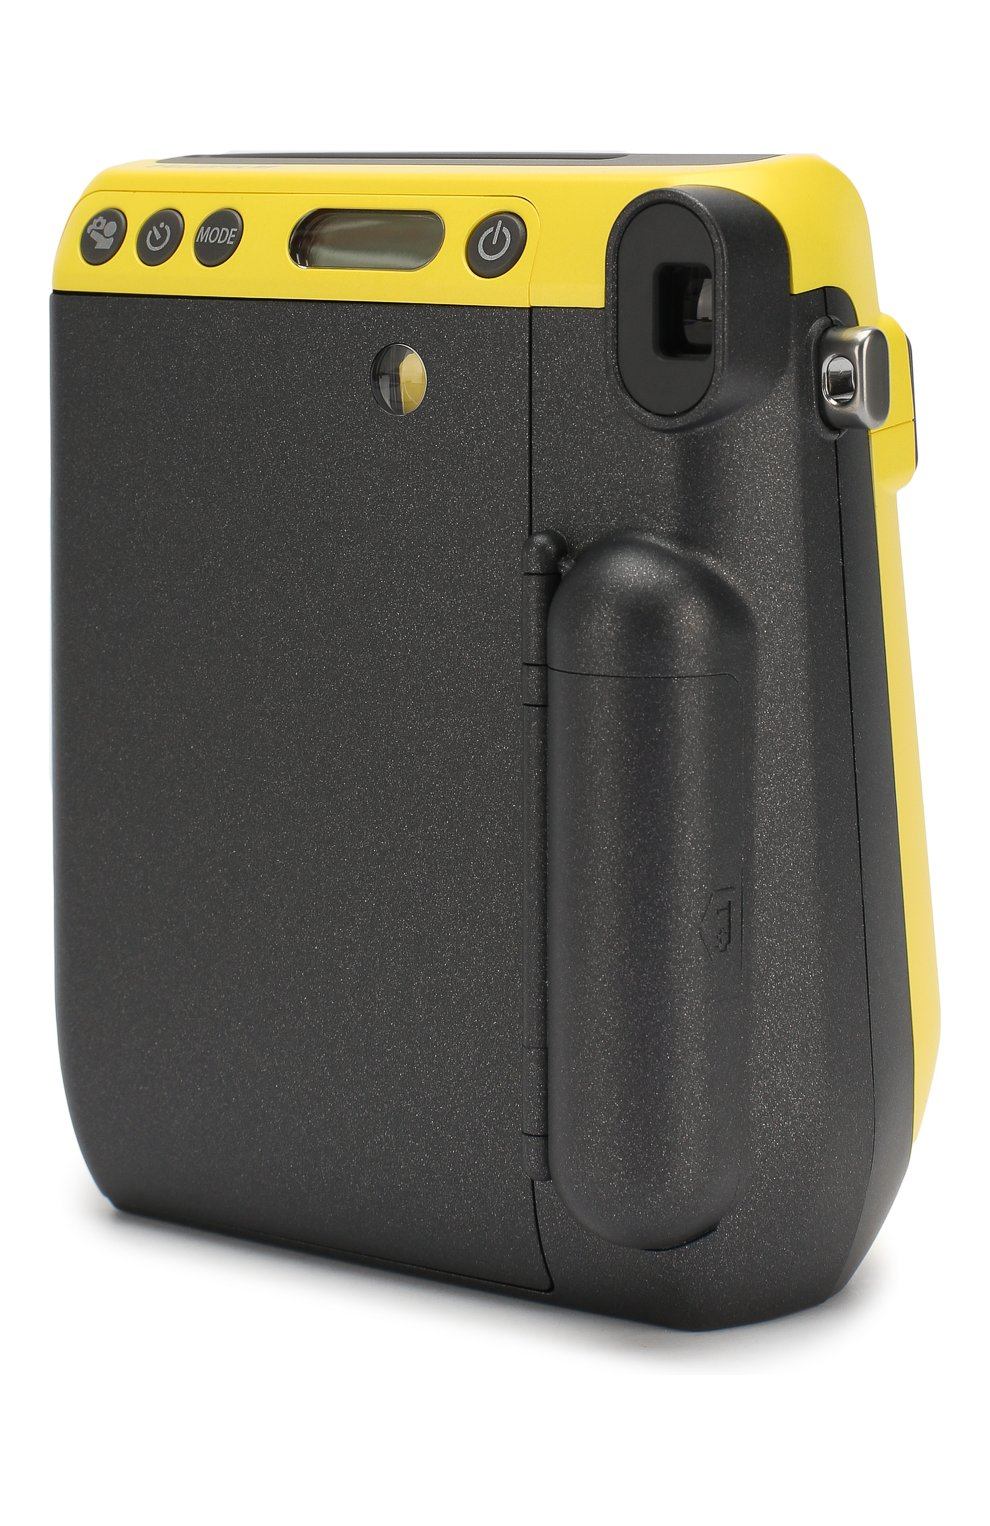 Фотоаппарат fujifilm instax mini 70 yellow INSTAX желтого цвета, арт. 4547410313901 | Фото 2